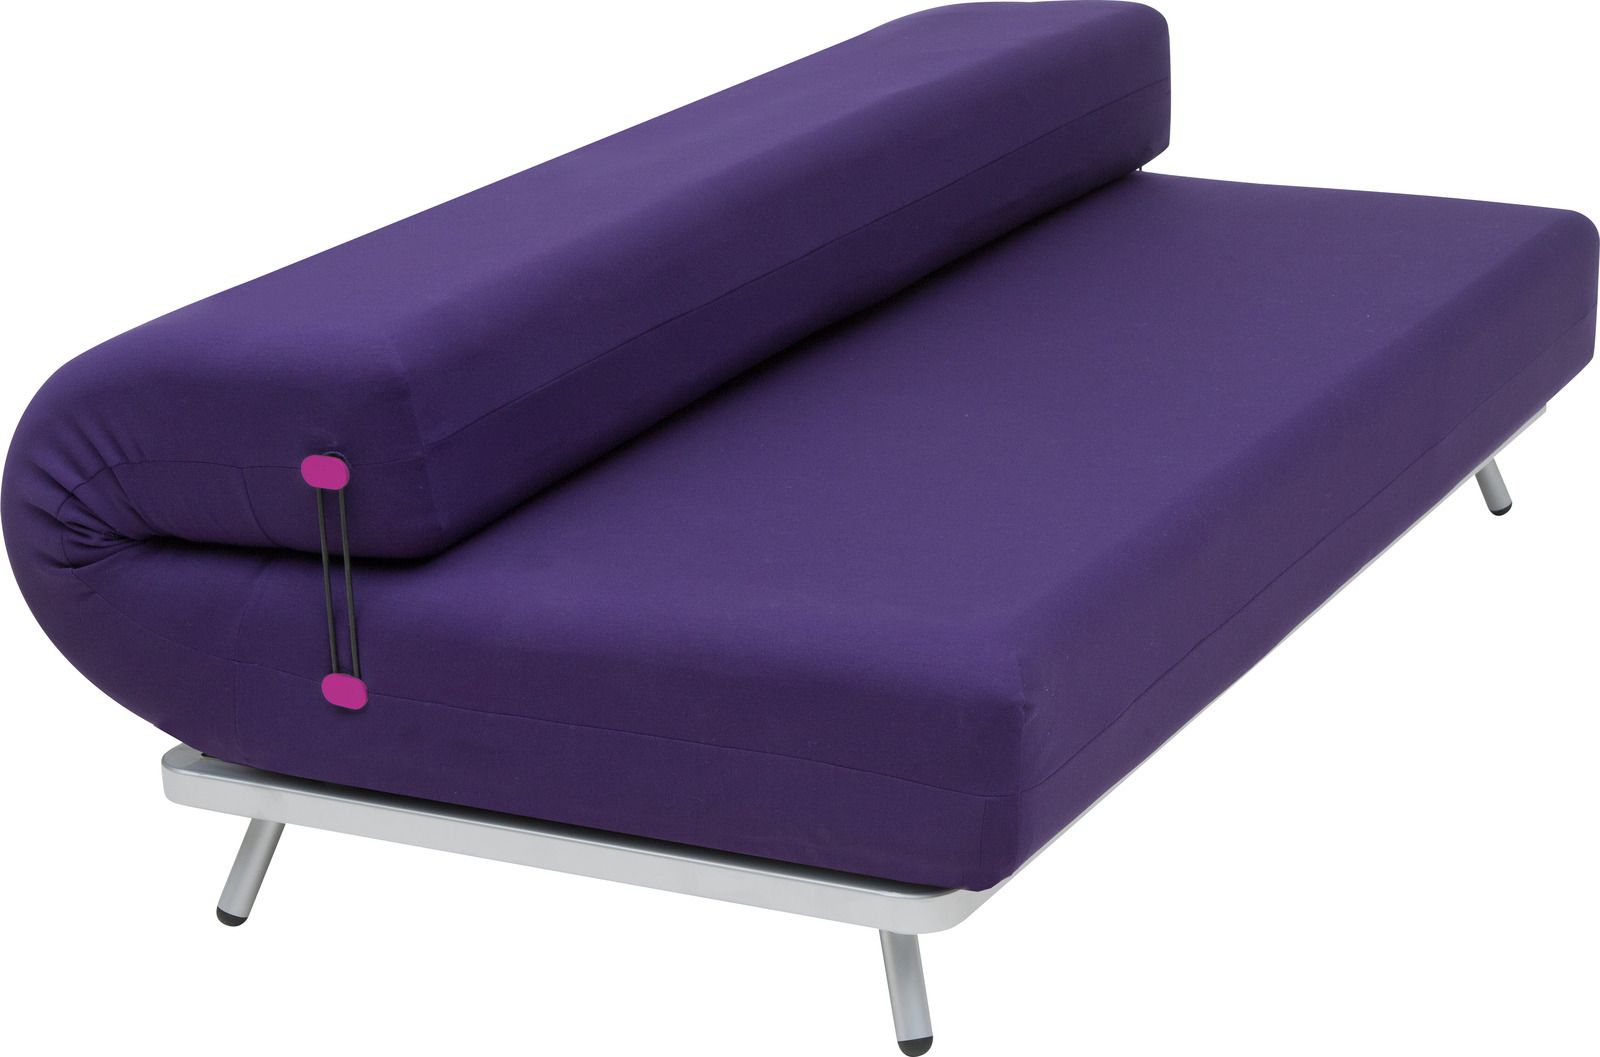 Karim Rashid Furniture Softline Rullo Andday Beds By Karim Rashid Furniture In Modern